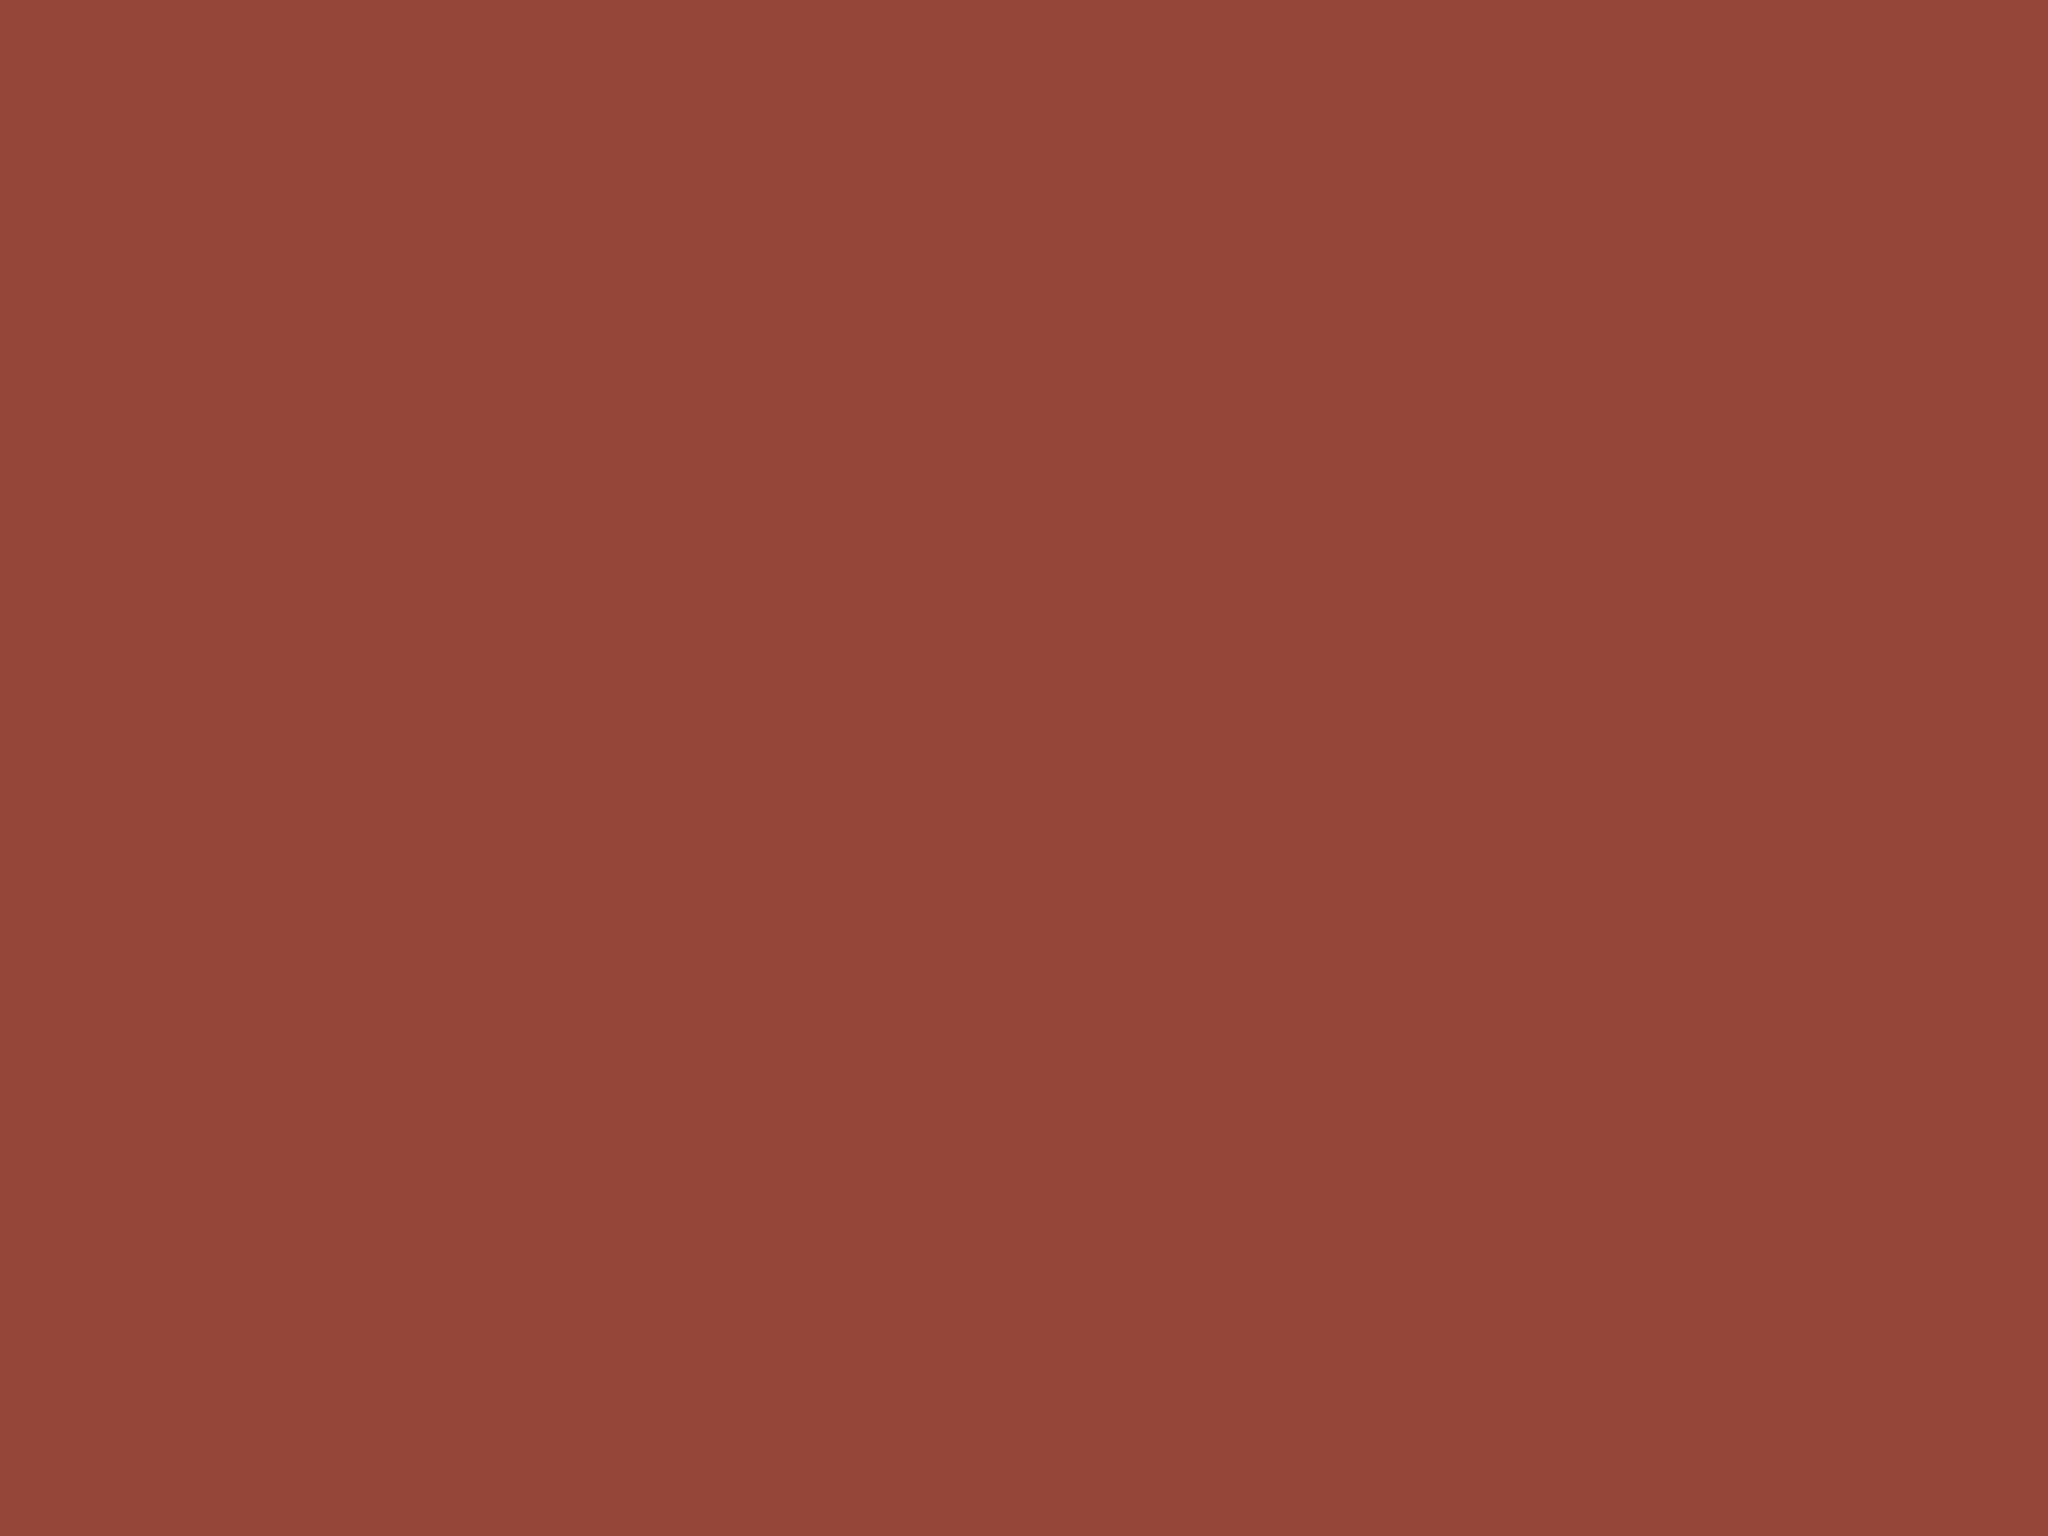 2048x1536 Chestnut Solid Color Background